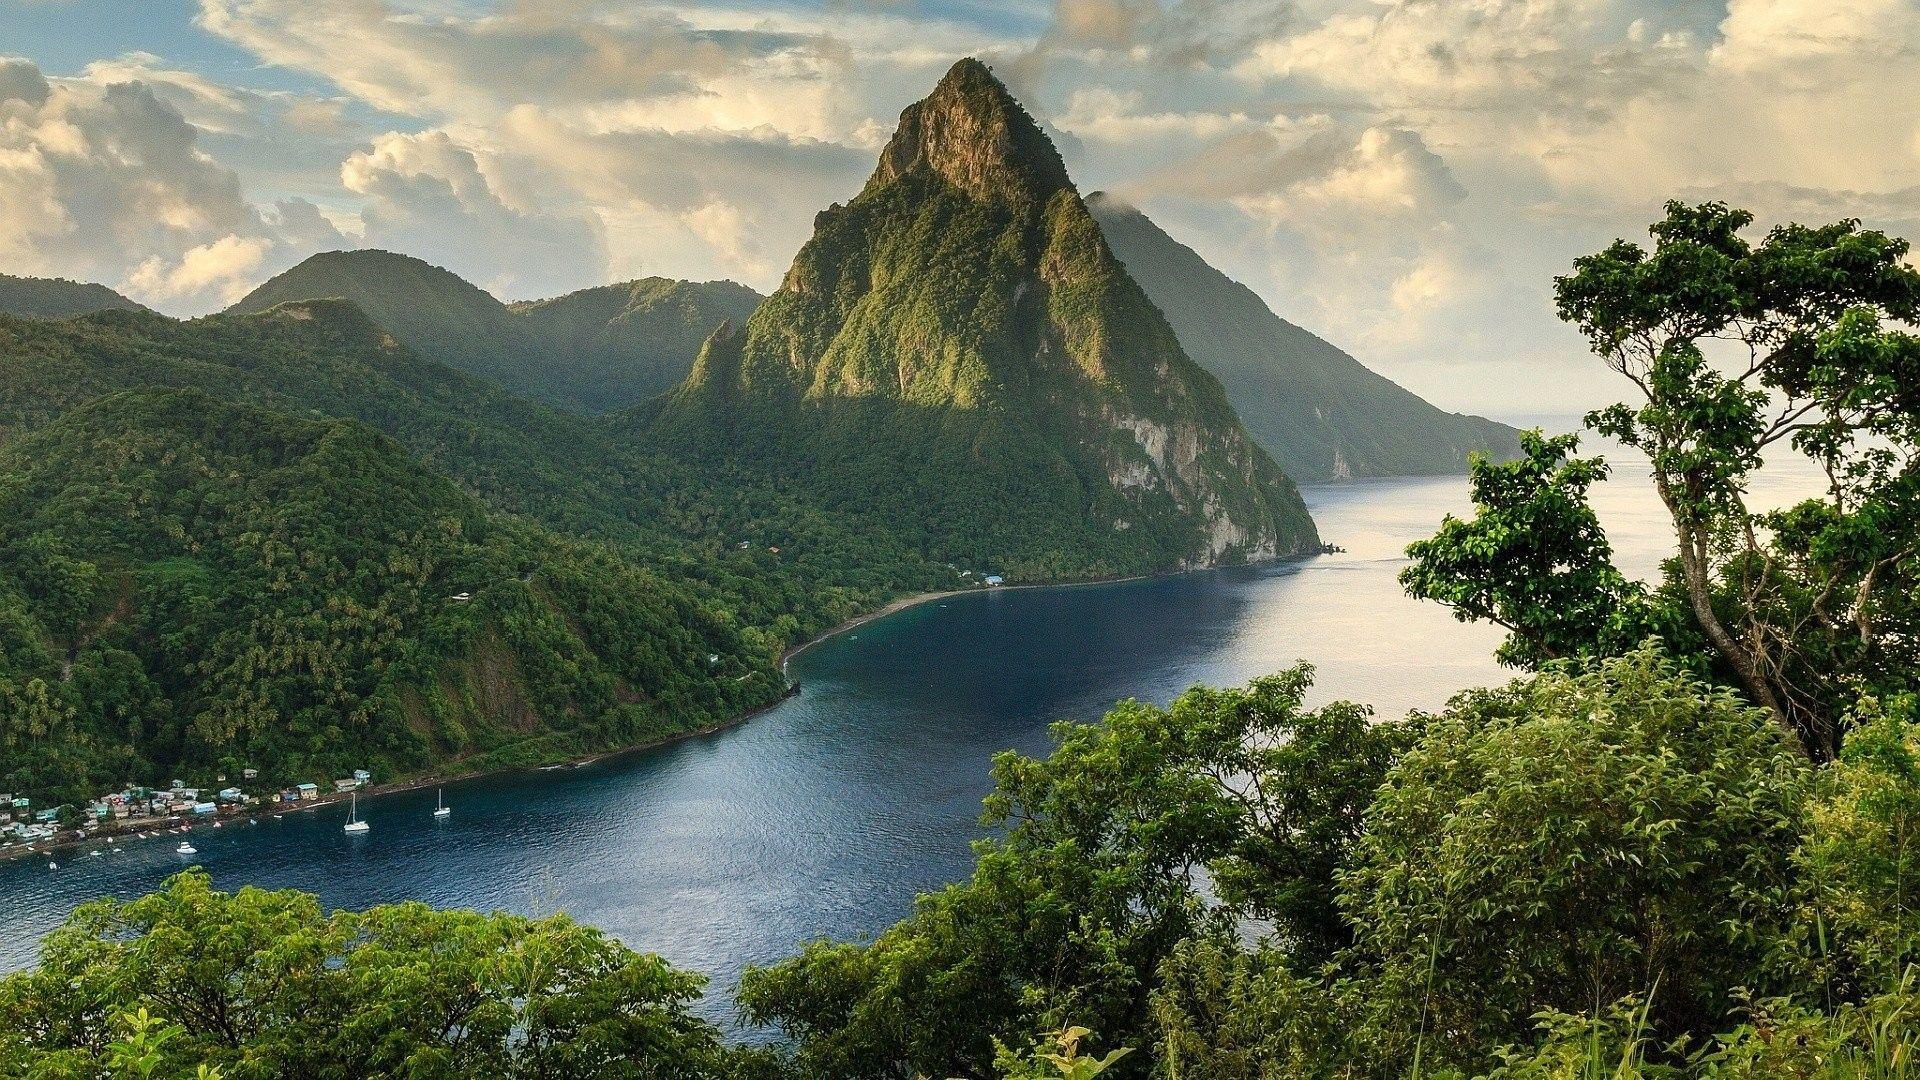 Brazil Landscape Wallpapers Top Free Brazil Landscape